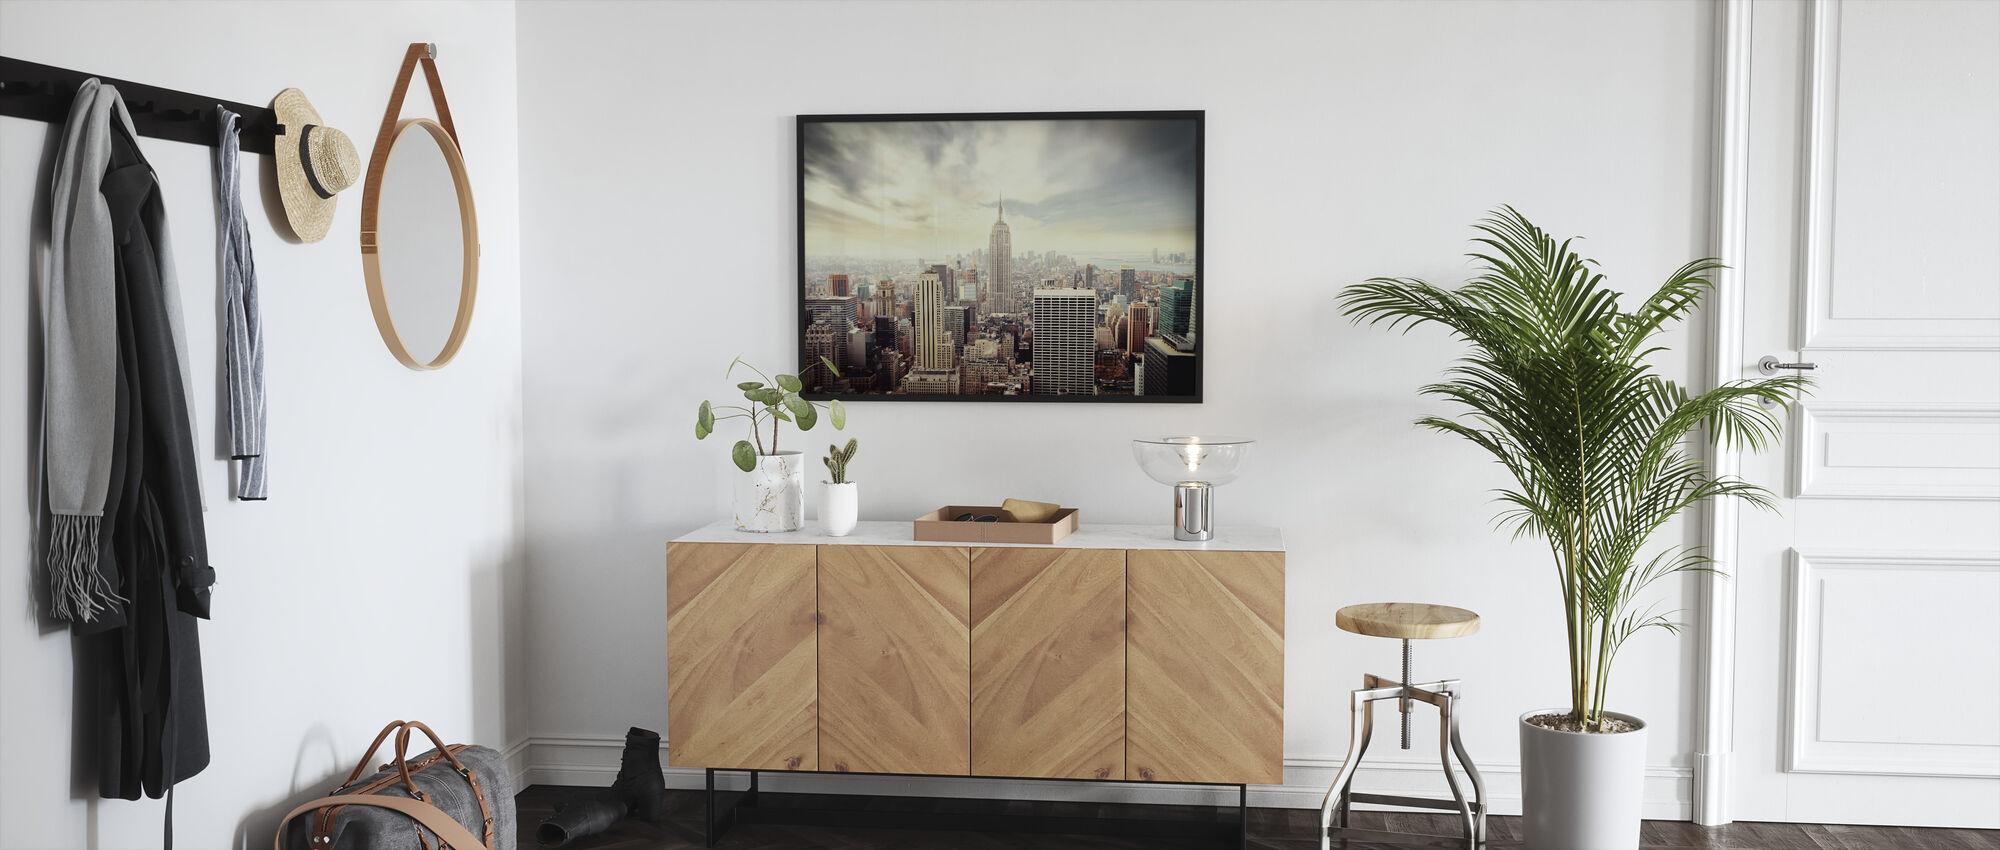 Enchanting New York - Vintage - Framed print - Hallway